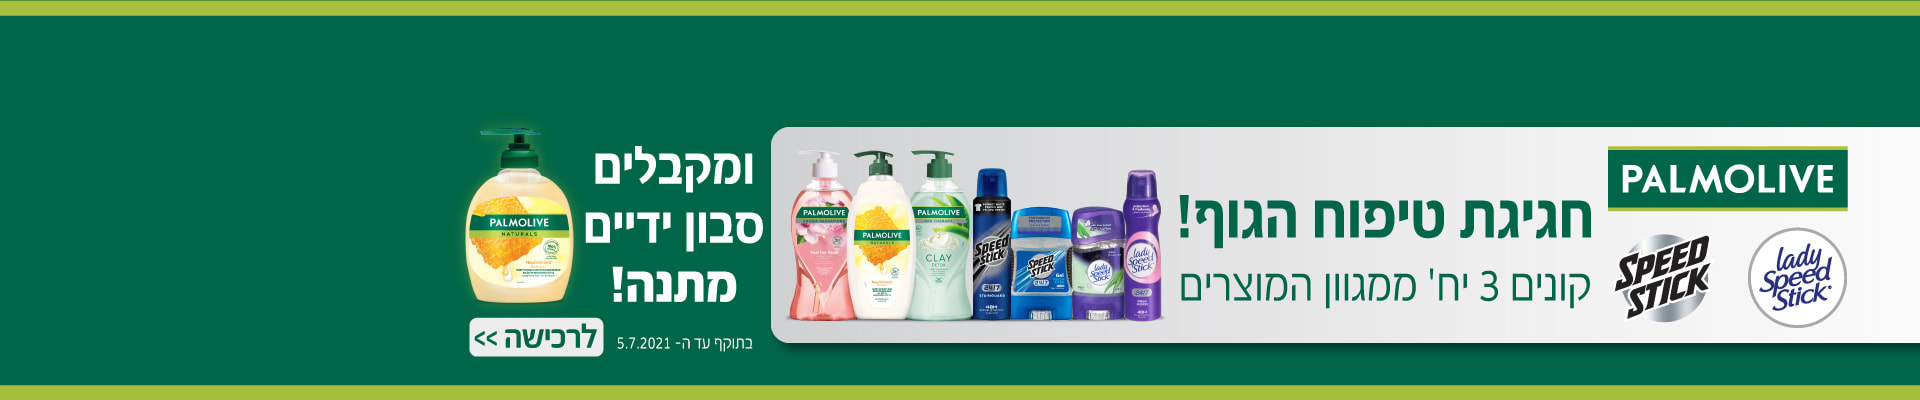 PALMOLIVE  SPEED STICK LADY SPEED STICK חגיגת טיפוח הגוף! קונים 3 יח' ממגוון המוצרים ומקבלים סבון ידיים מתנה! לרכישה בתוקף עד ה- 5.7.2021